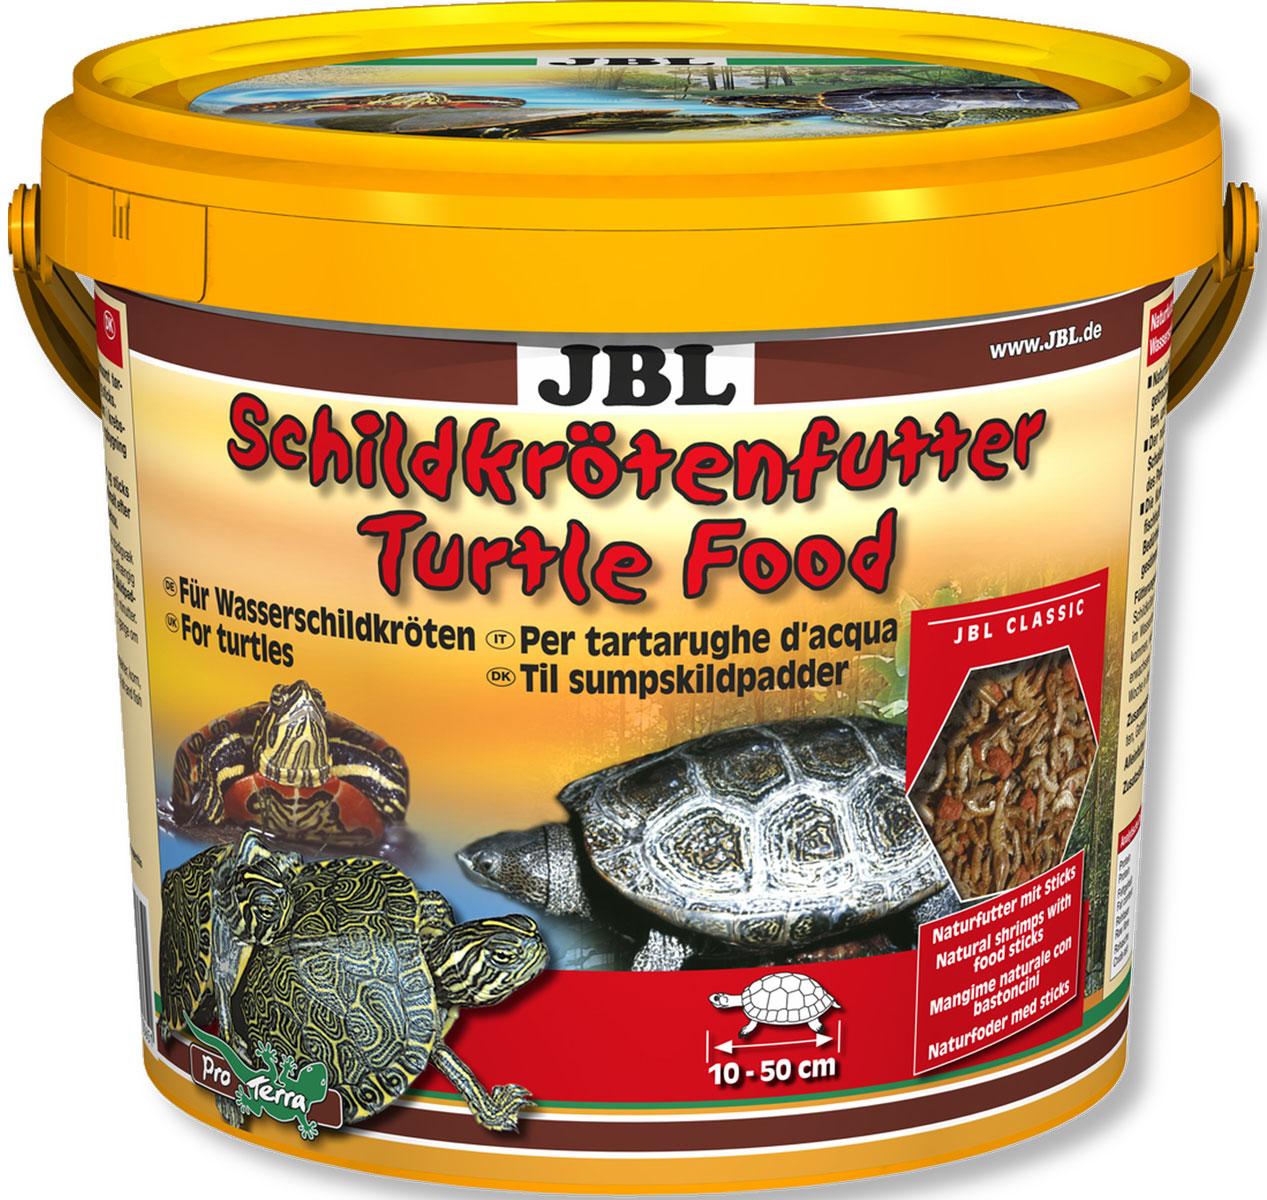 JBL Schildkroetenfutter Основной корм для черепах, 1000 мл (120 г)JBL7036400JBL Schildkroetenfutter - Основной корм для черепах, 1000 мл. (120 г.)